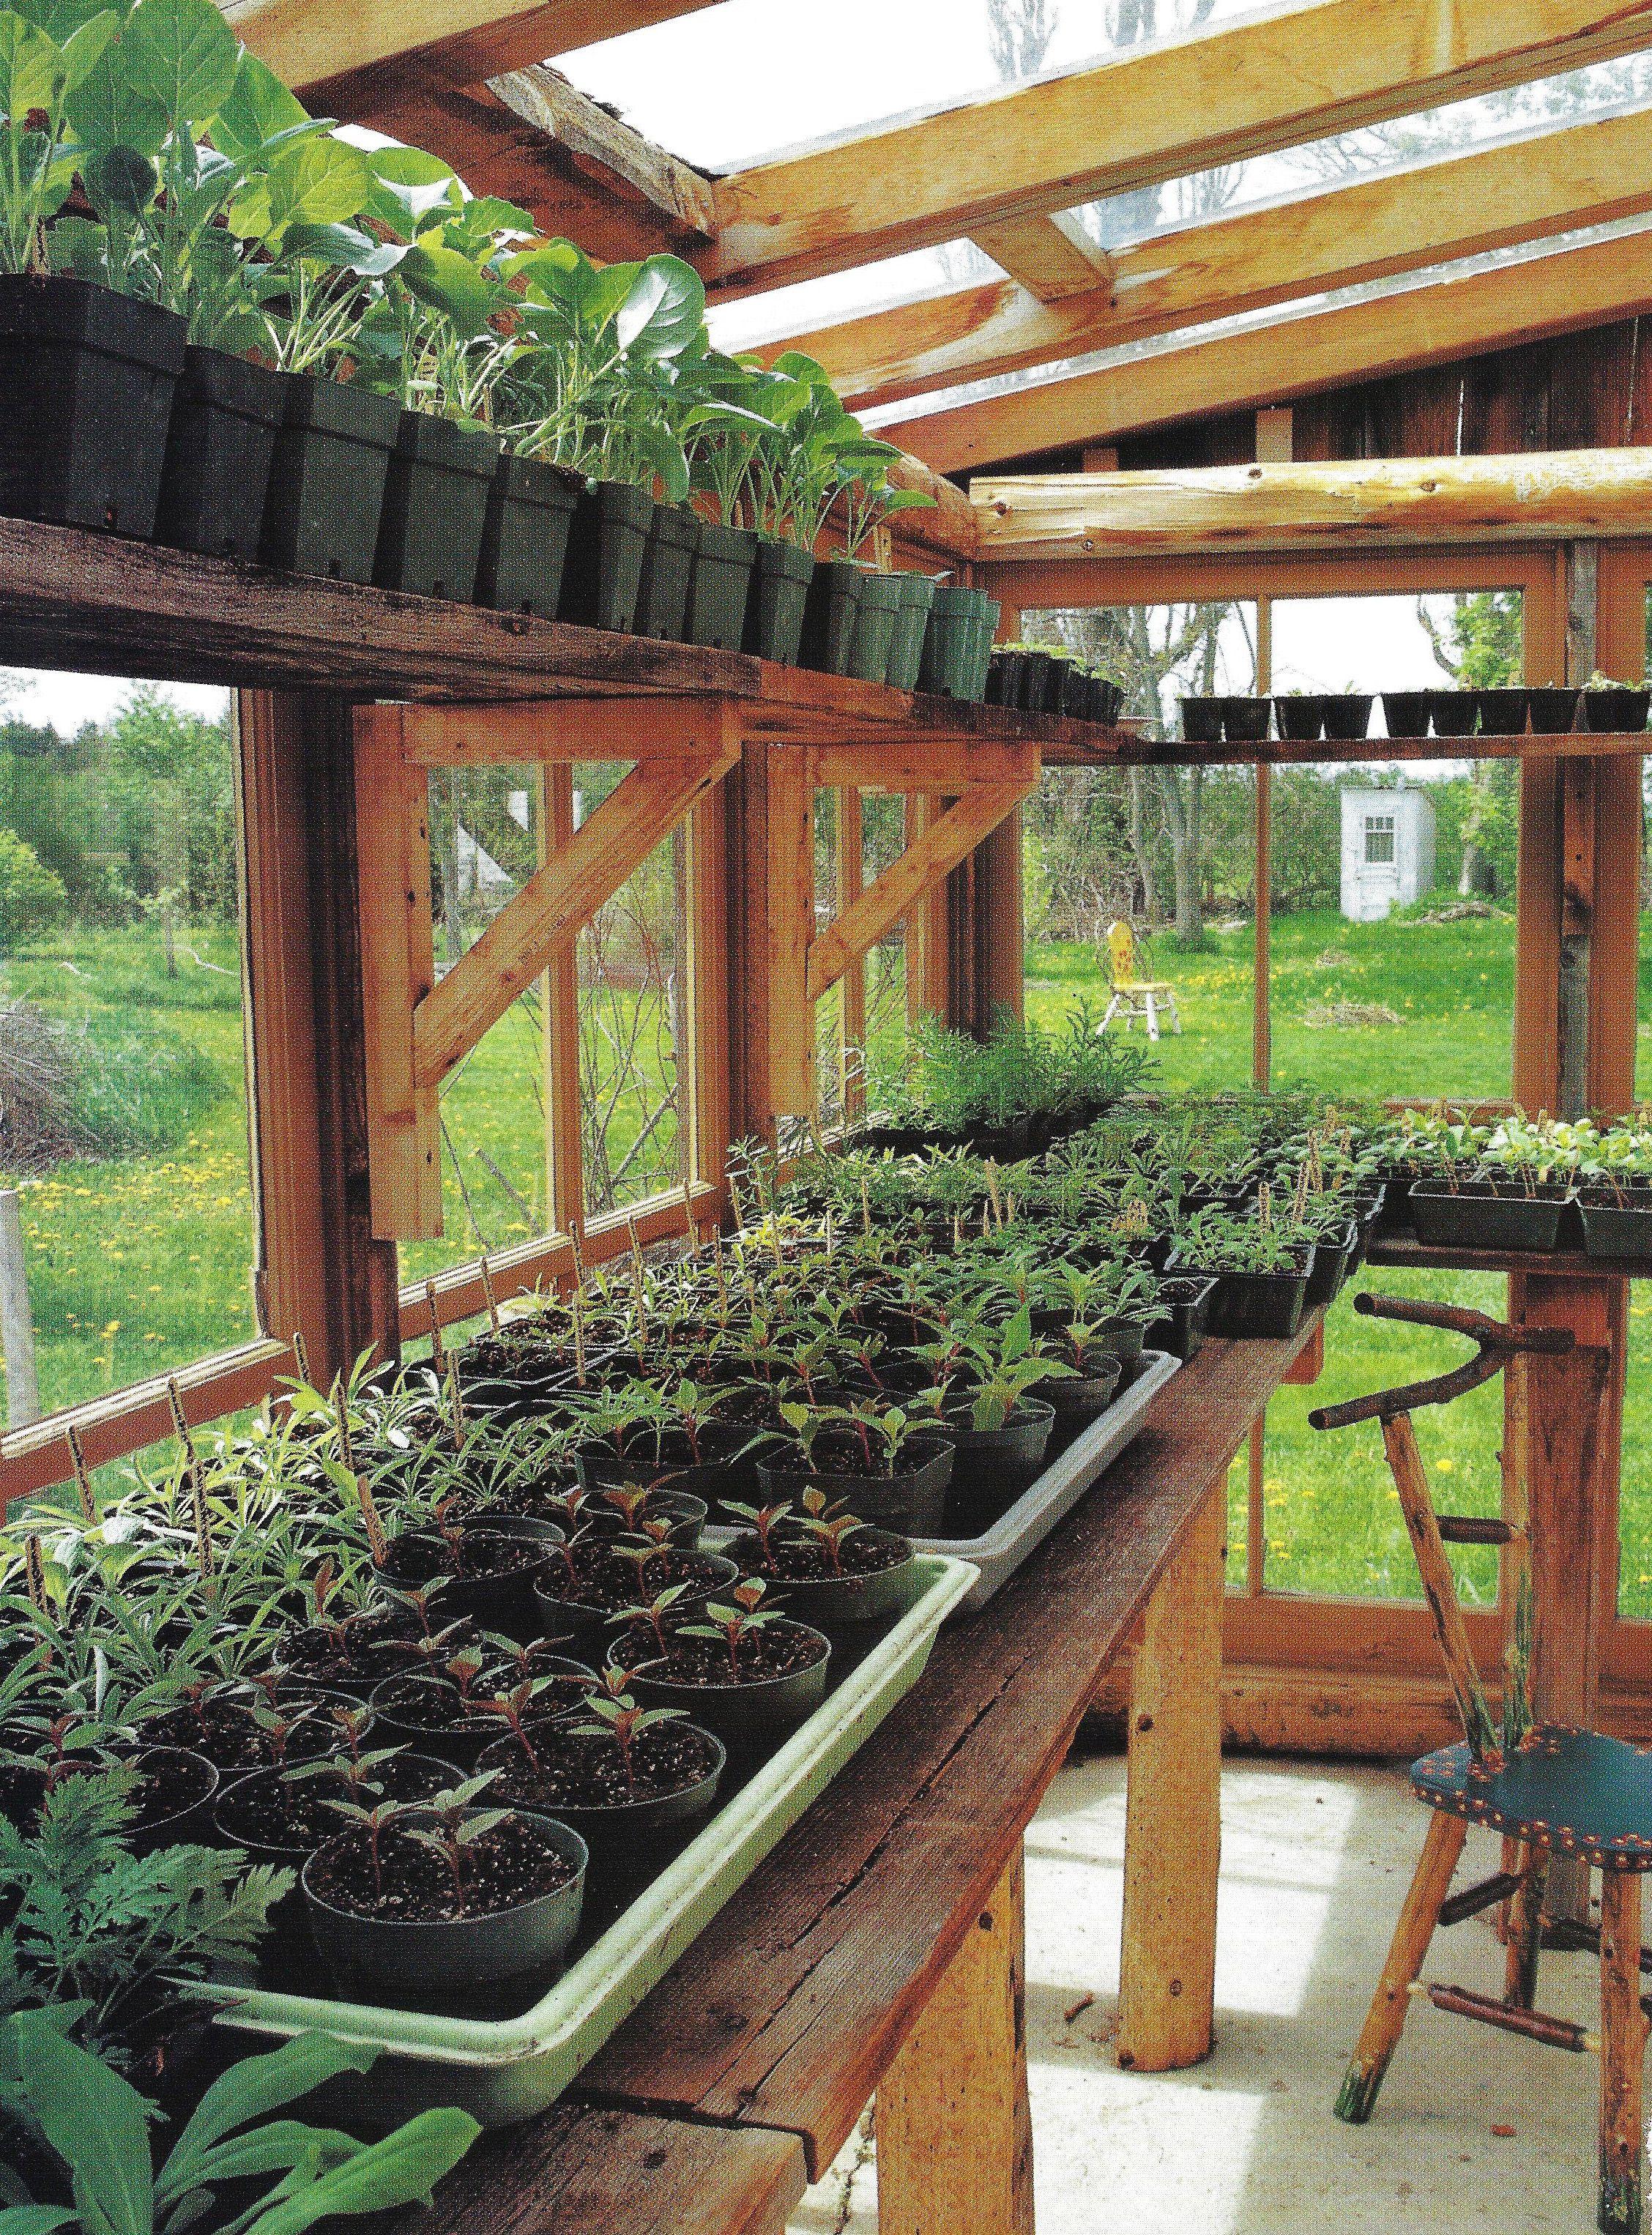 Backyard Greenhouse | Greenhouse and gardening | Pinterest | Garten ...